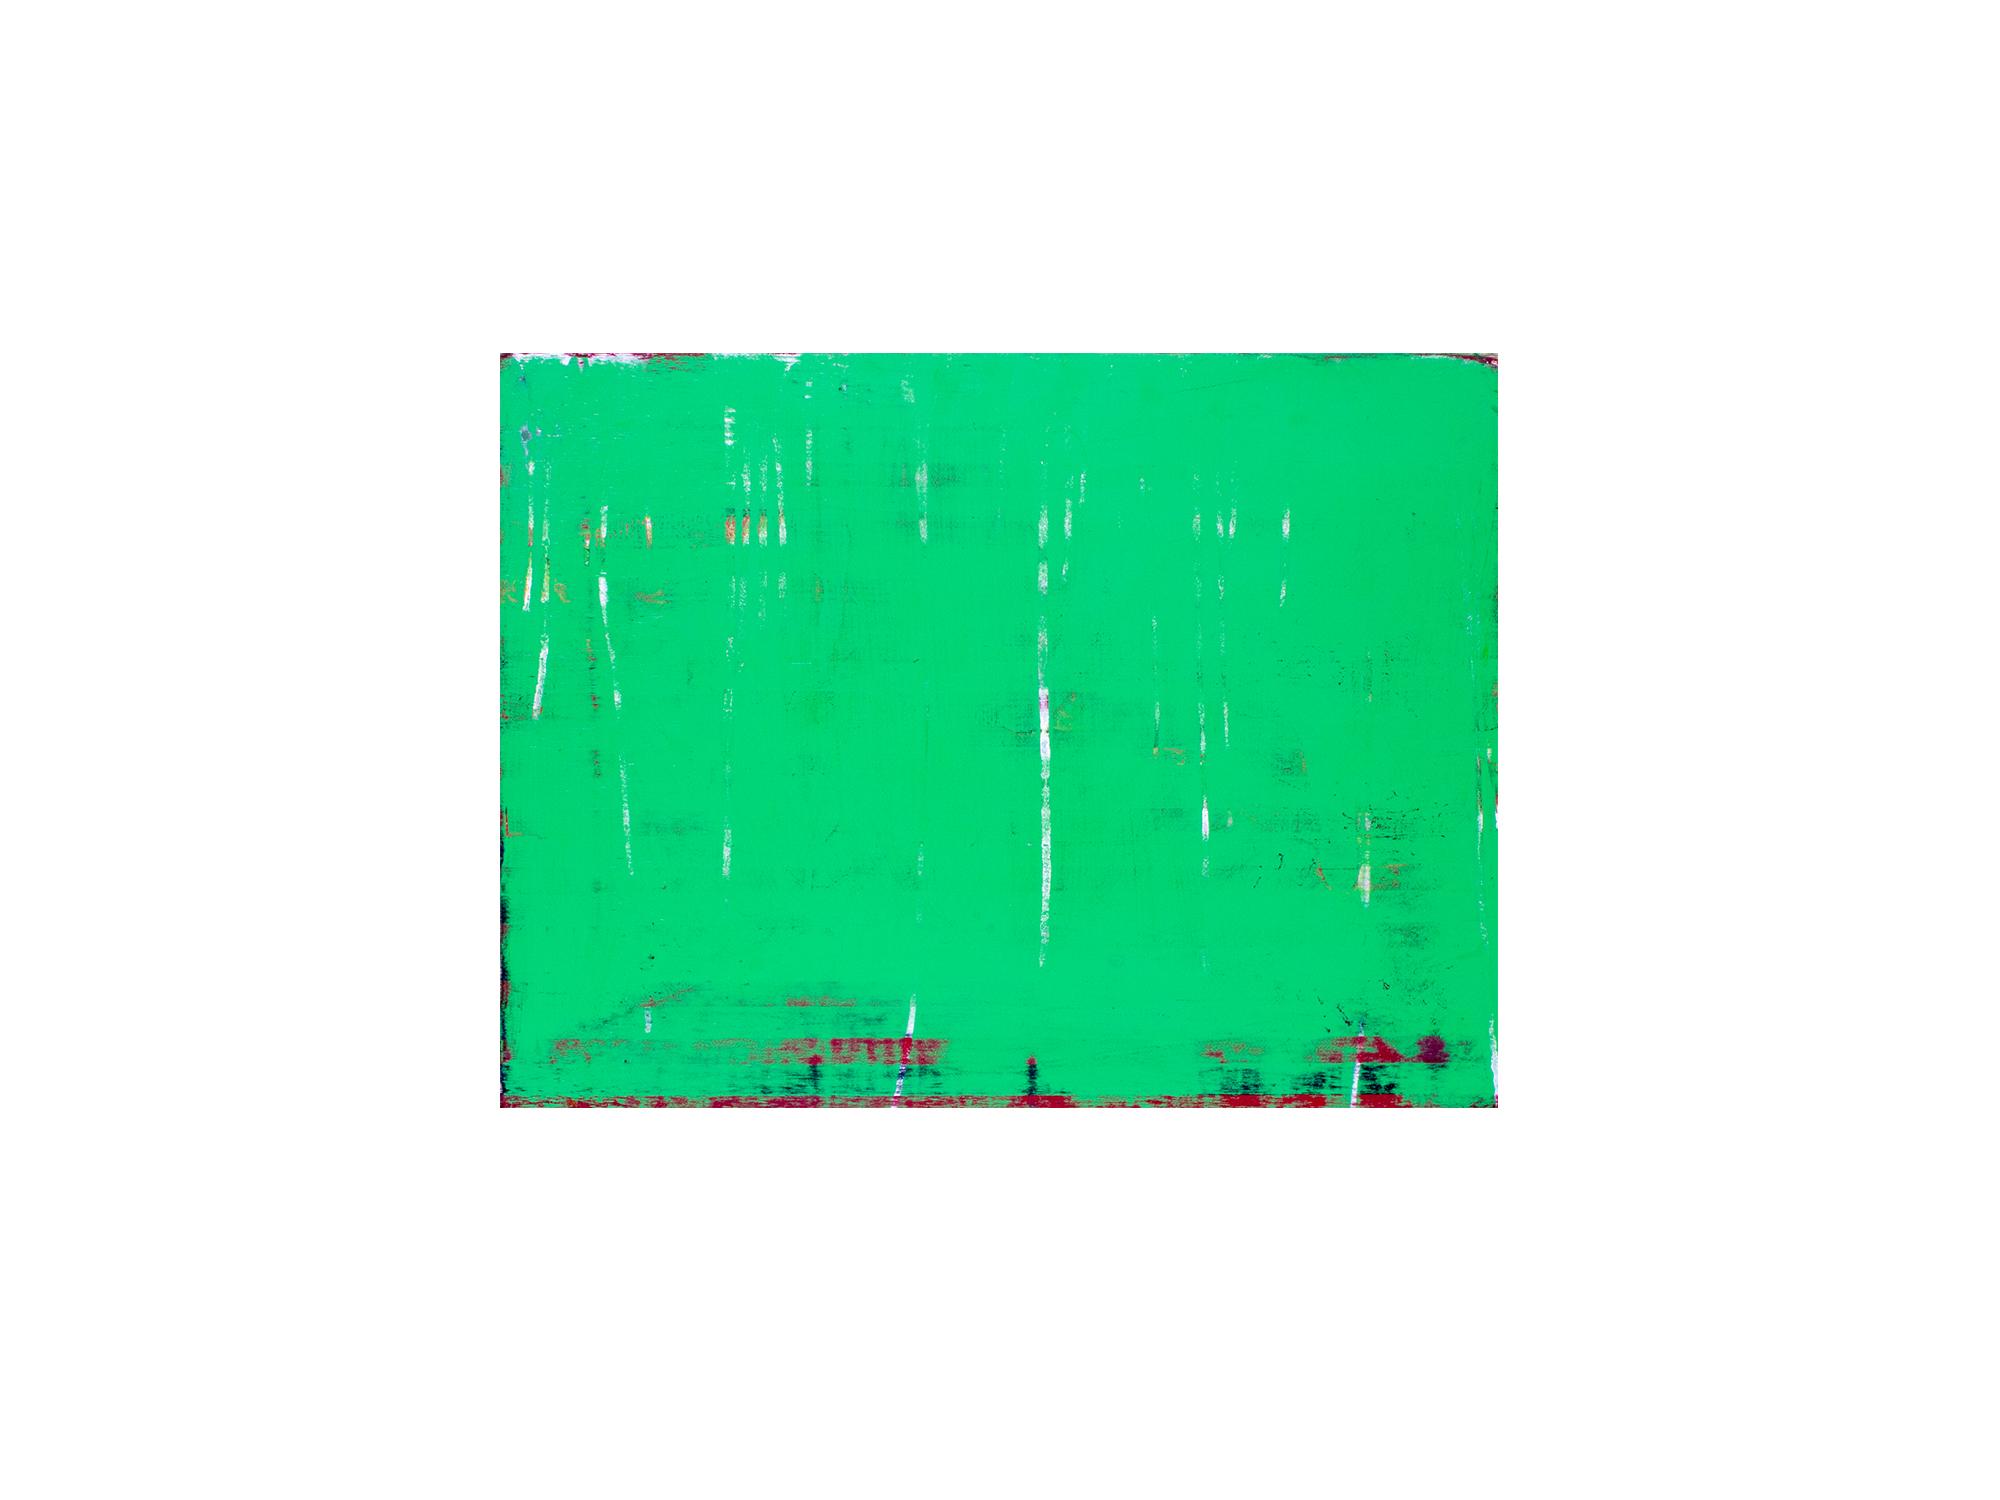 Brett McMahon   KL City 3 , 2017 acrylic and enamel on ply panel 60 x 80cm   ARTIST BIO